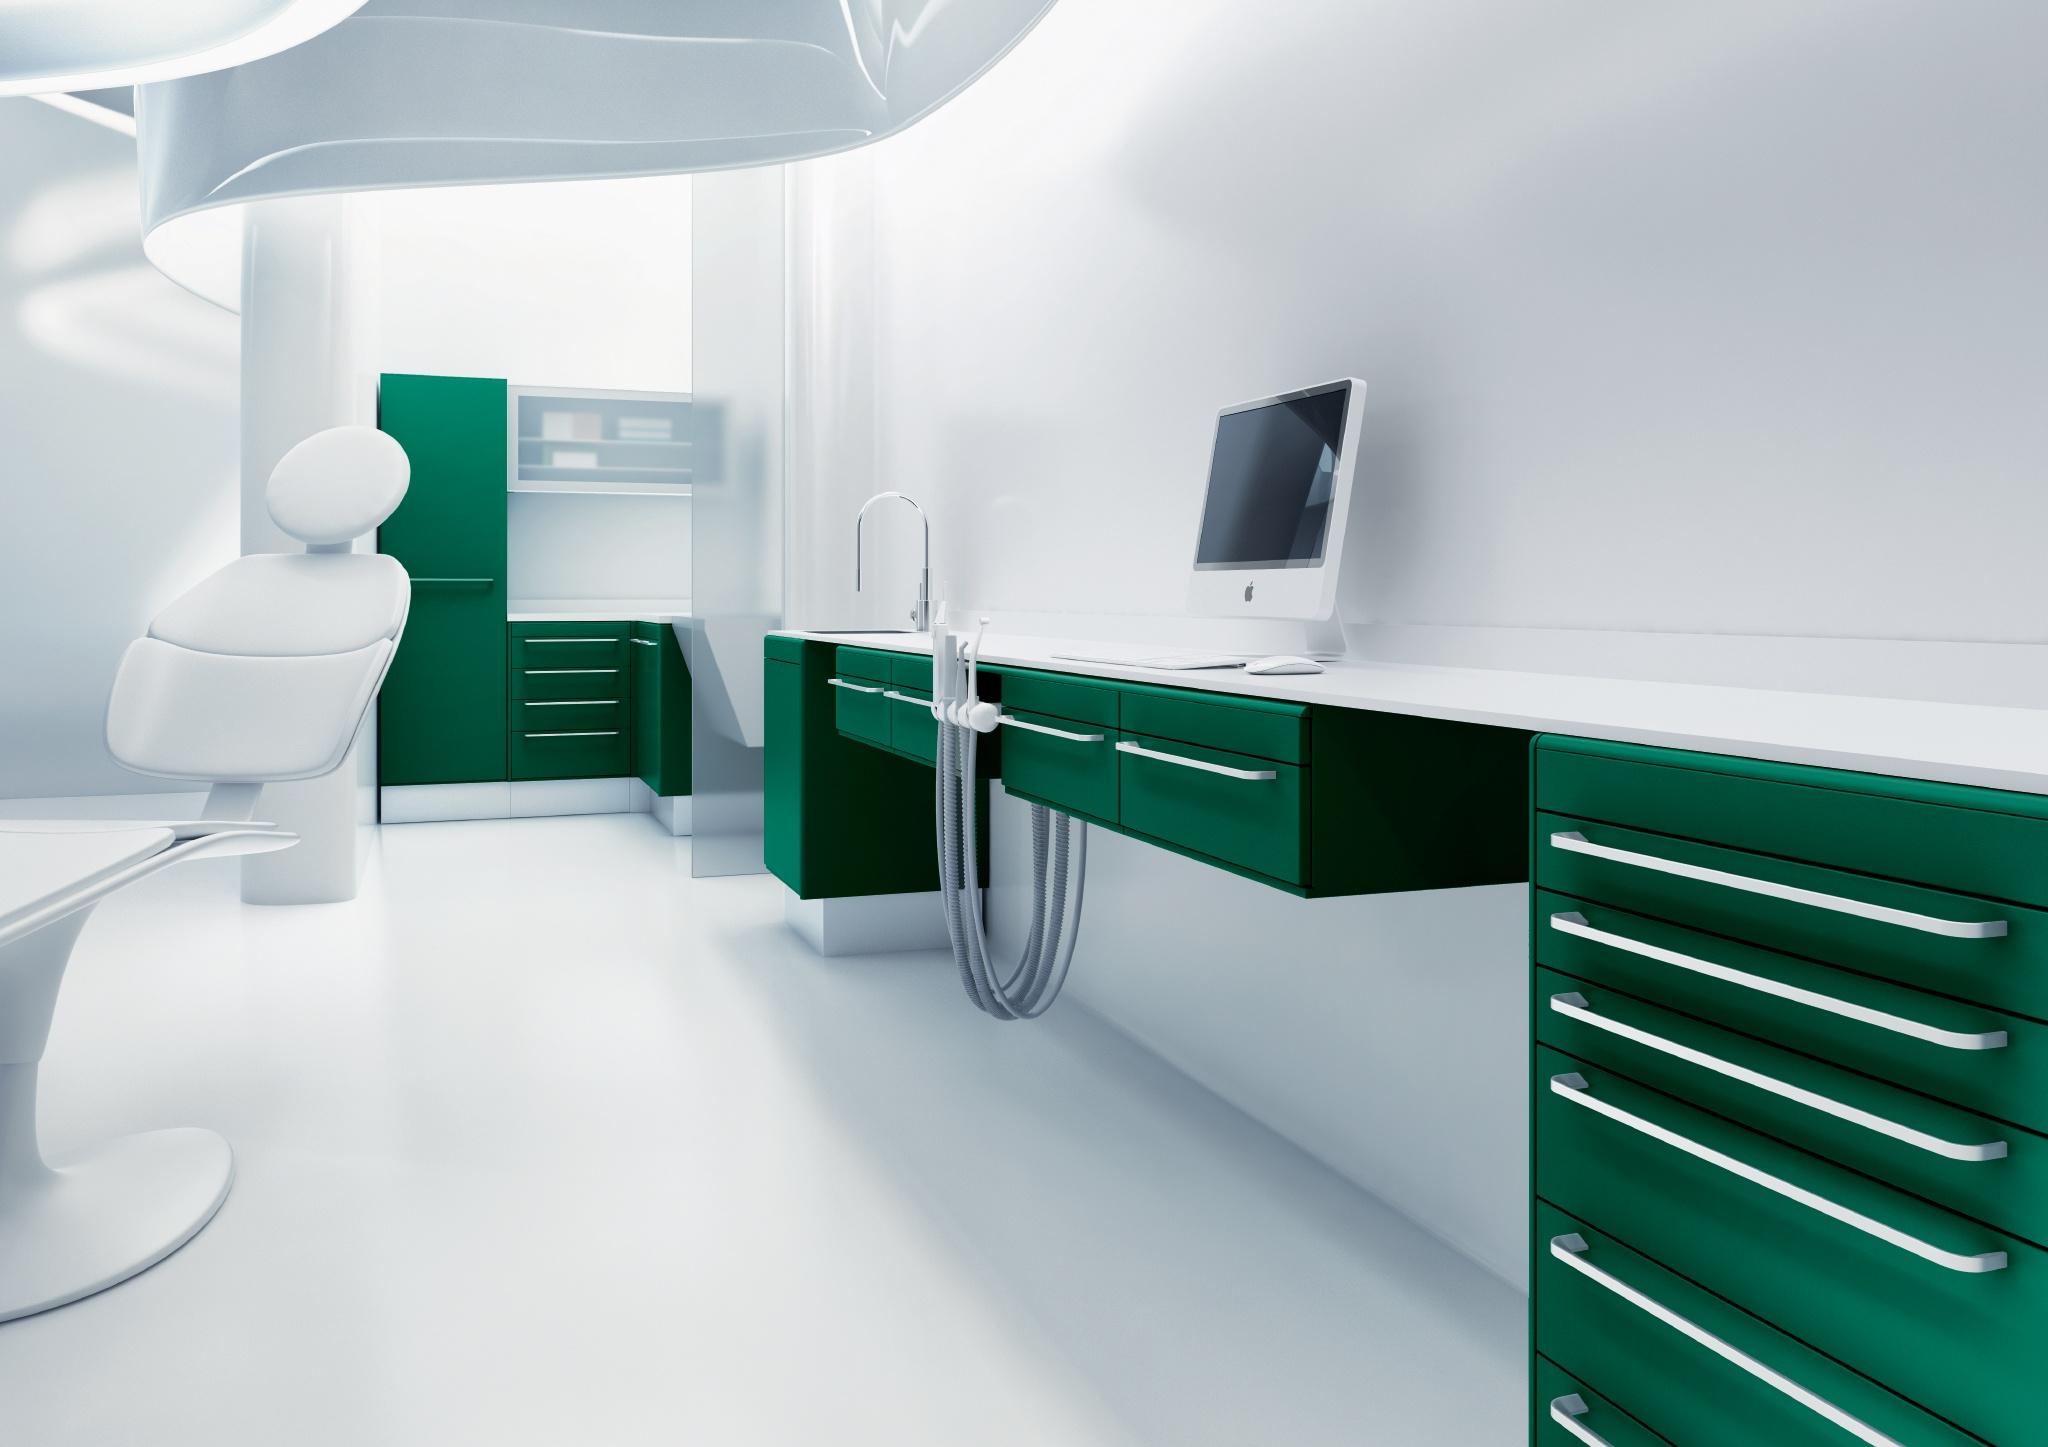 ad solution cr ation et quipement de cabinet dentaire. Black Bedroom Furniture Sets. Home Design Ideas